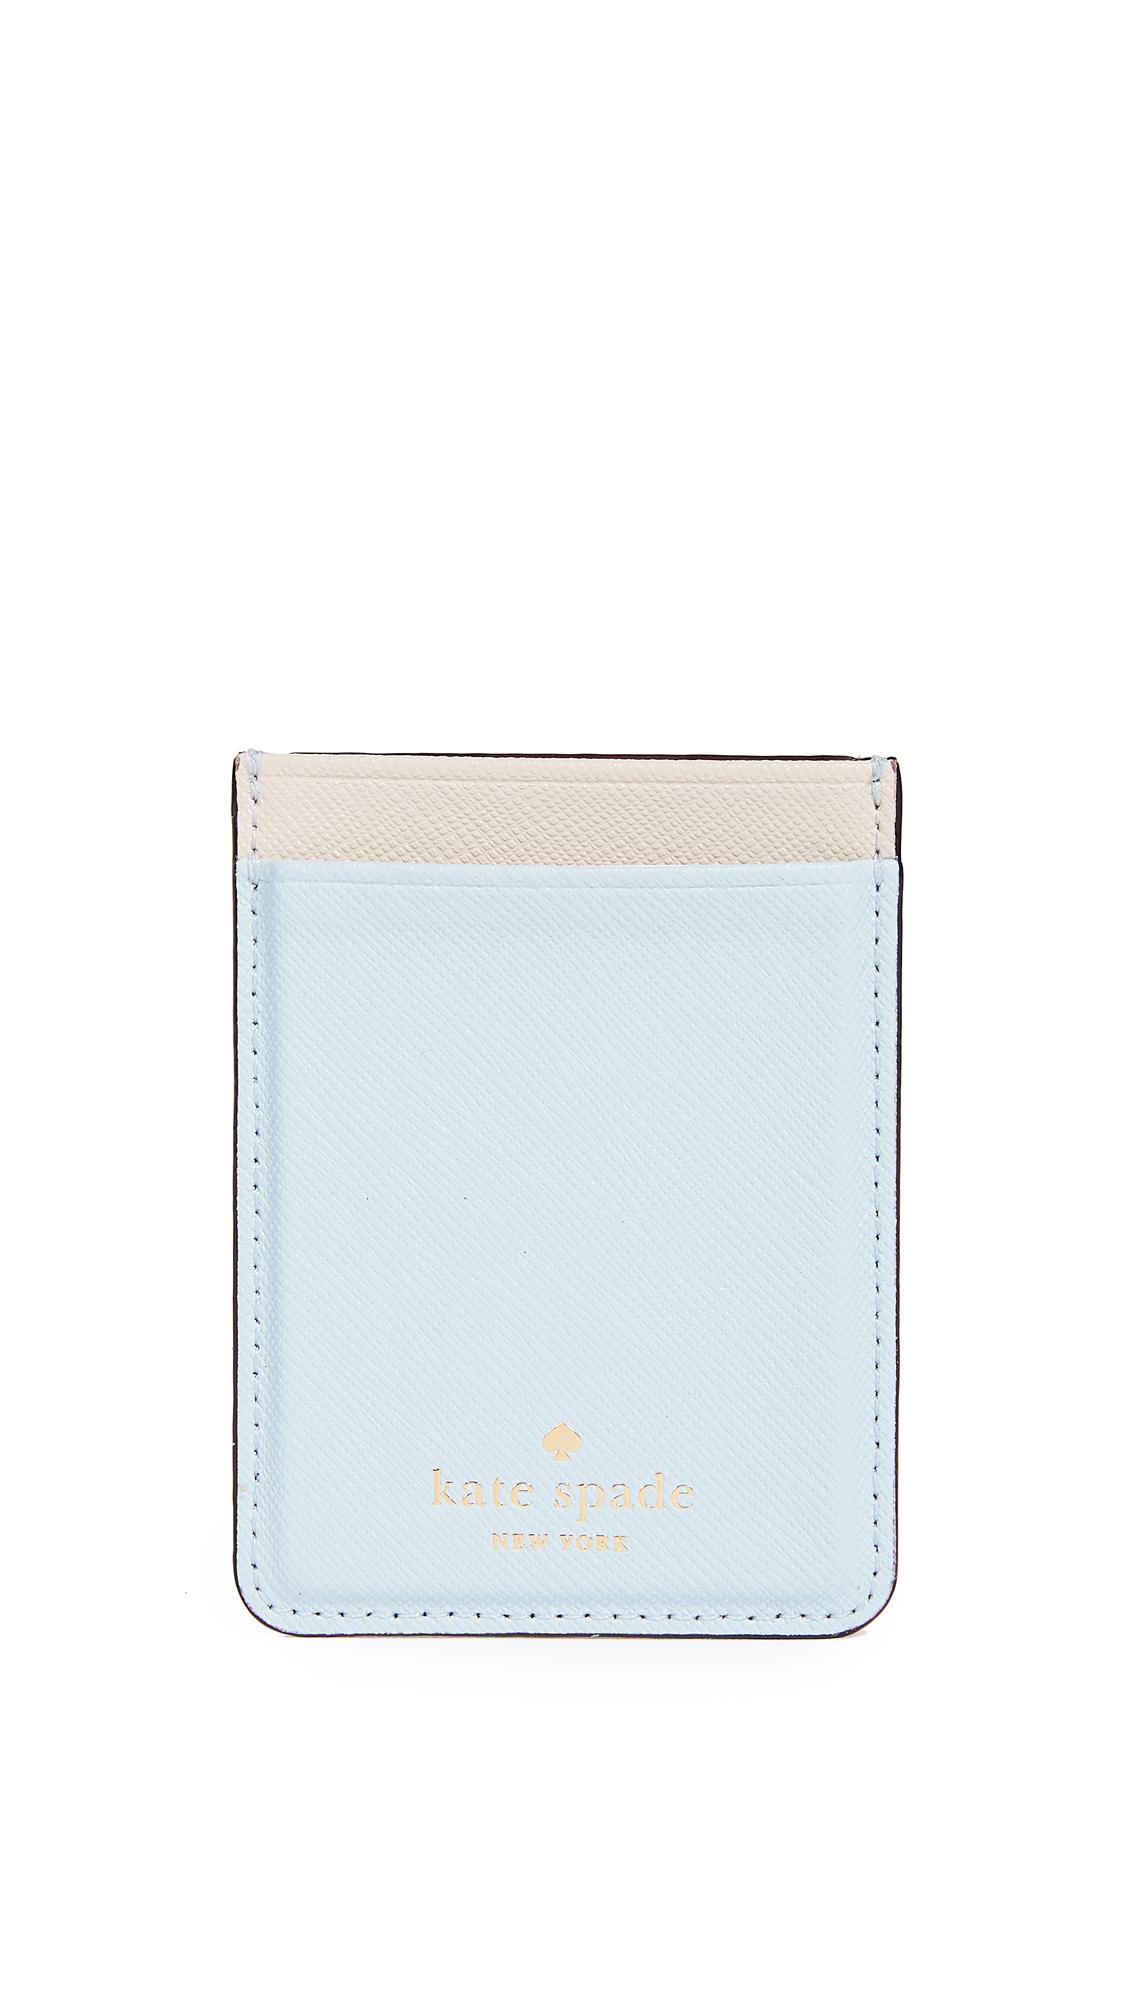 Kate Spade New York Double Sticker Phone Pocket - Shimmer Blue/Tusk